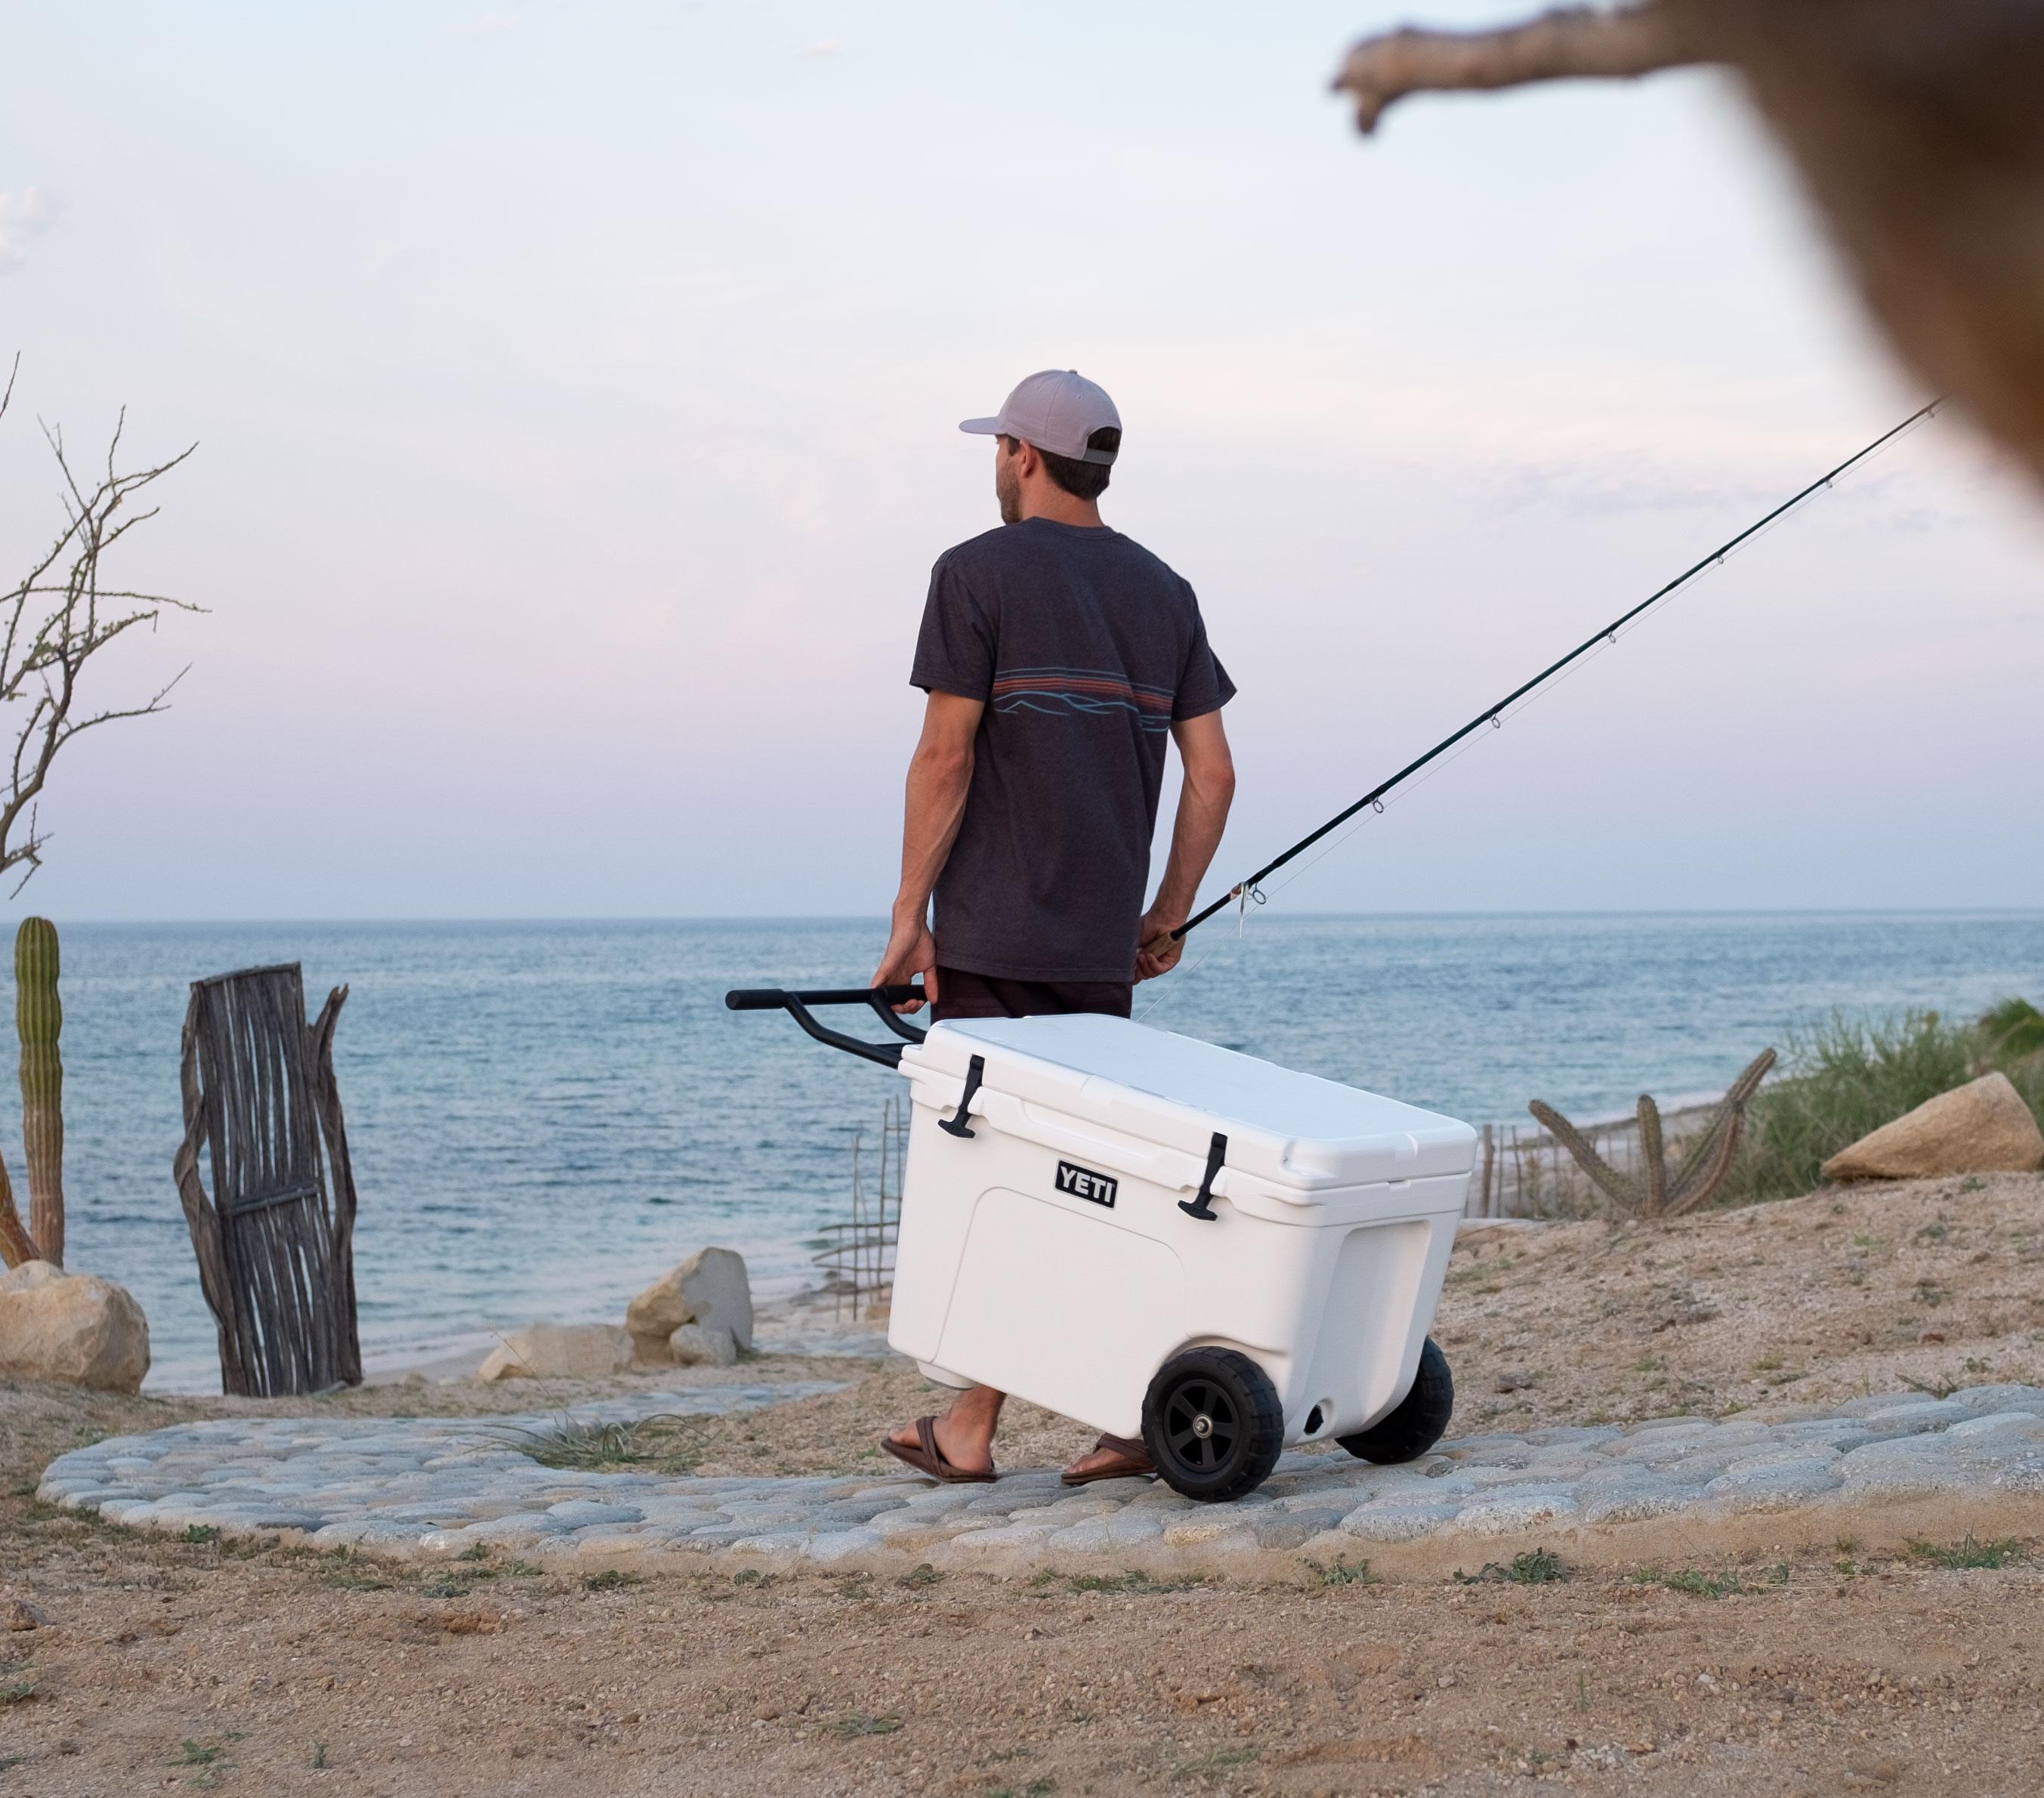 Man pulling Yeti cooler onto beach